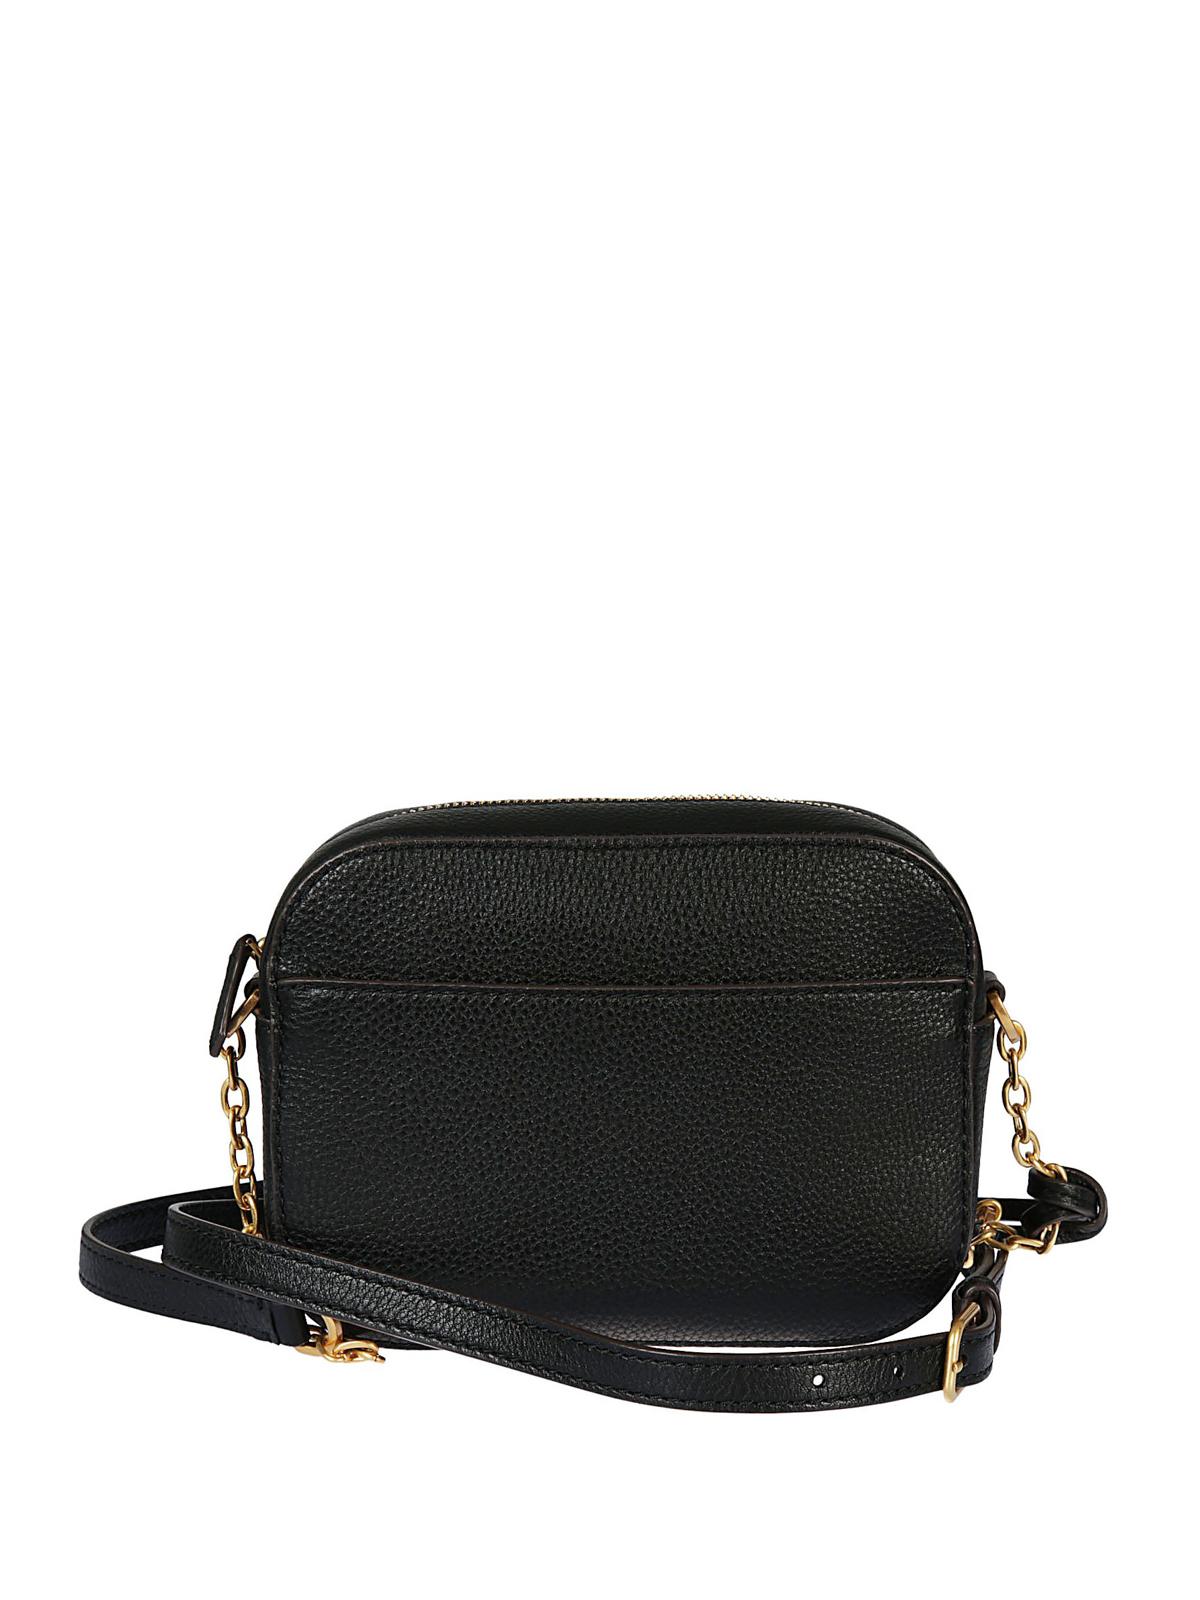 Tory Burch Mcgraw Black Leather Cross Body Bag Bags Adjustable Chain Ikrix